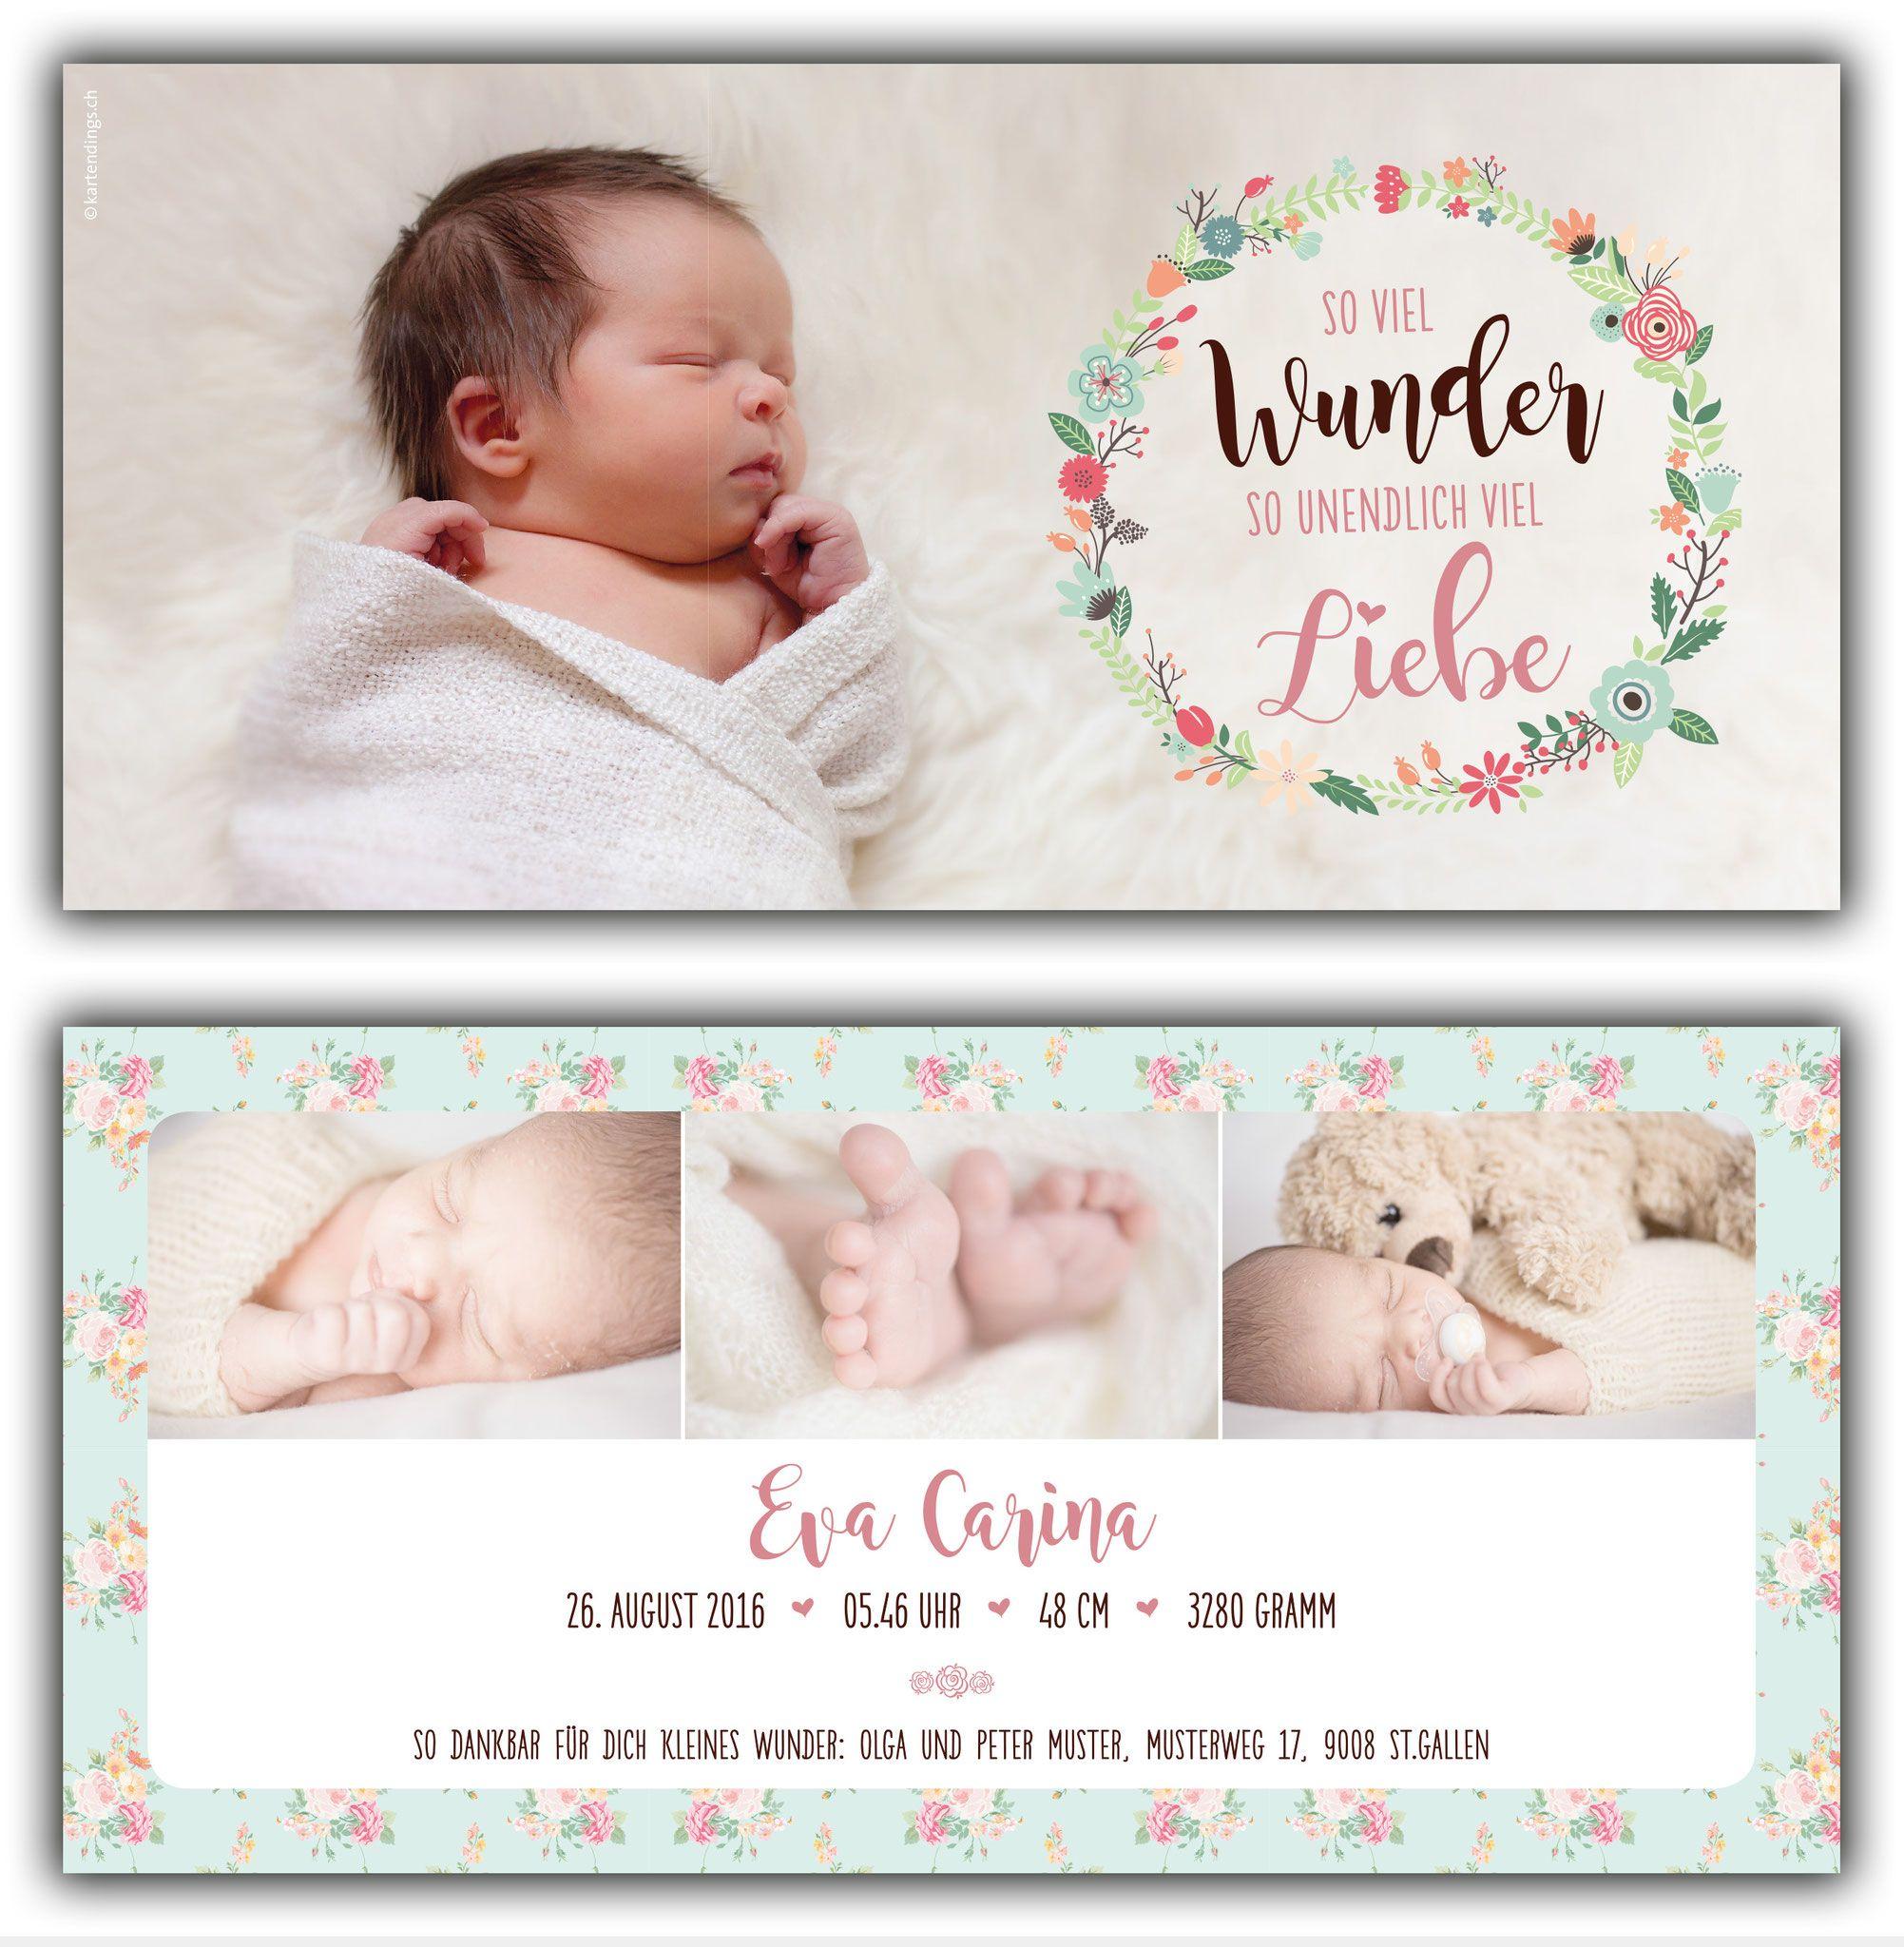 2 Seitig Kartendings Das Ding Fur Kartendesign Geburtskarte Geburtsanzeige Dankeskarte Geburtskarten Geburtsanzeige Dankeskarte Geburt